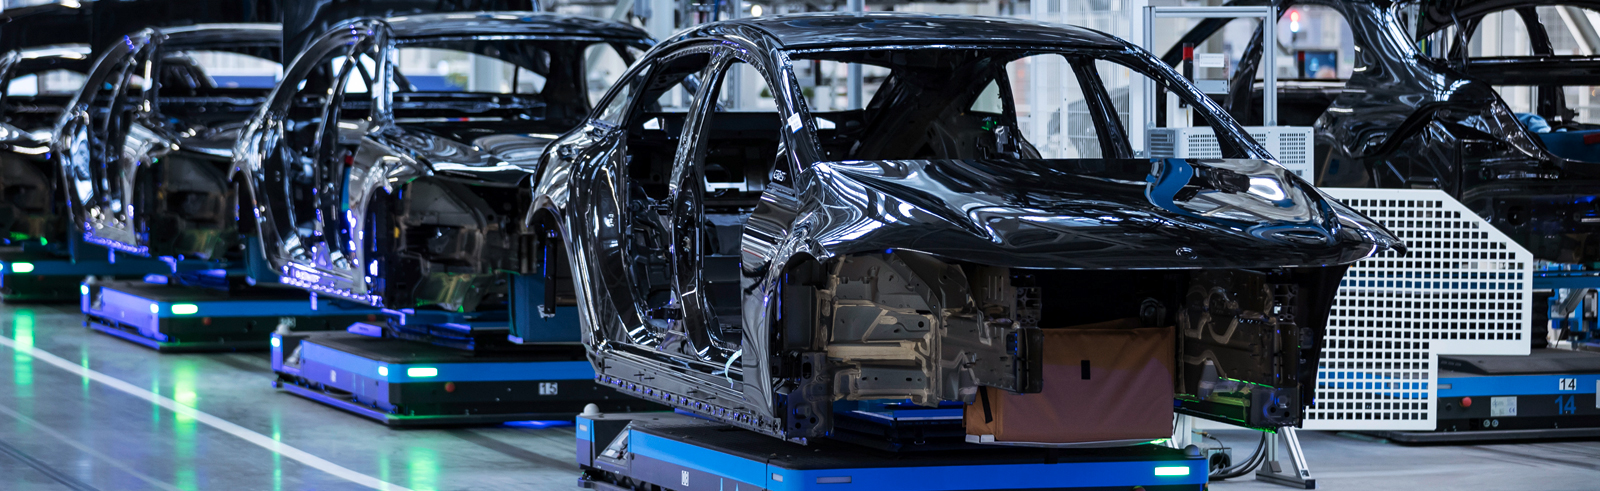 The Mercedes-Benz EQS enters production at Factory 56 in Sindelfingen